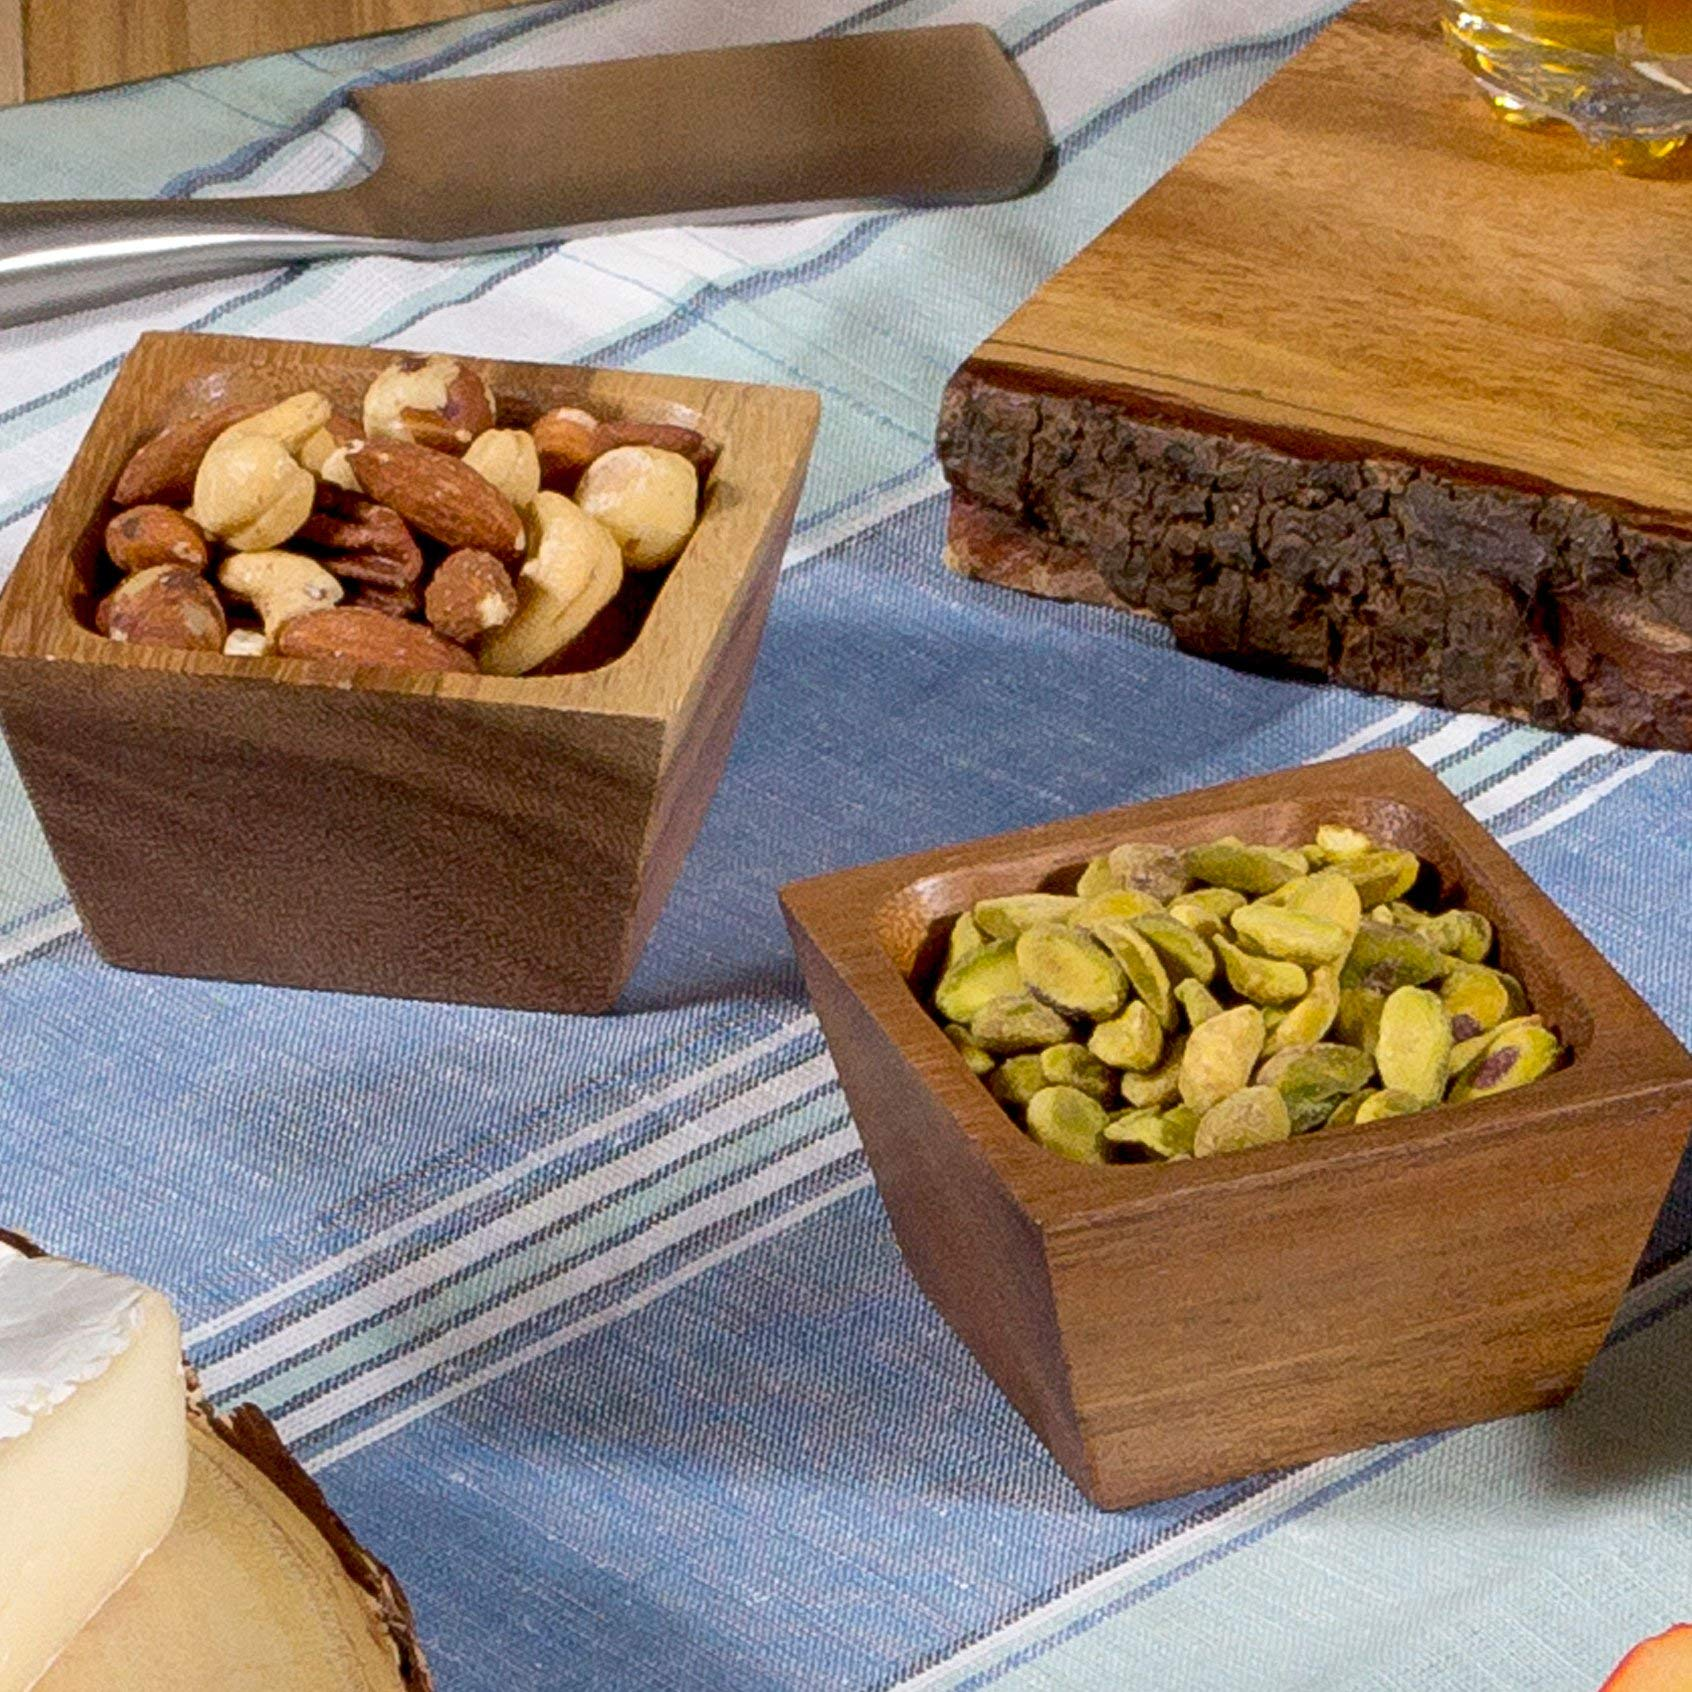 Lipper International 1100-2 Acacia Wood Square Salt Pinch or Serving Bowls, 3'' x 3'' x 2-1/2'', Set of 2 by Lipper International (Image #5)